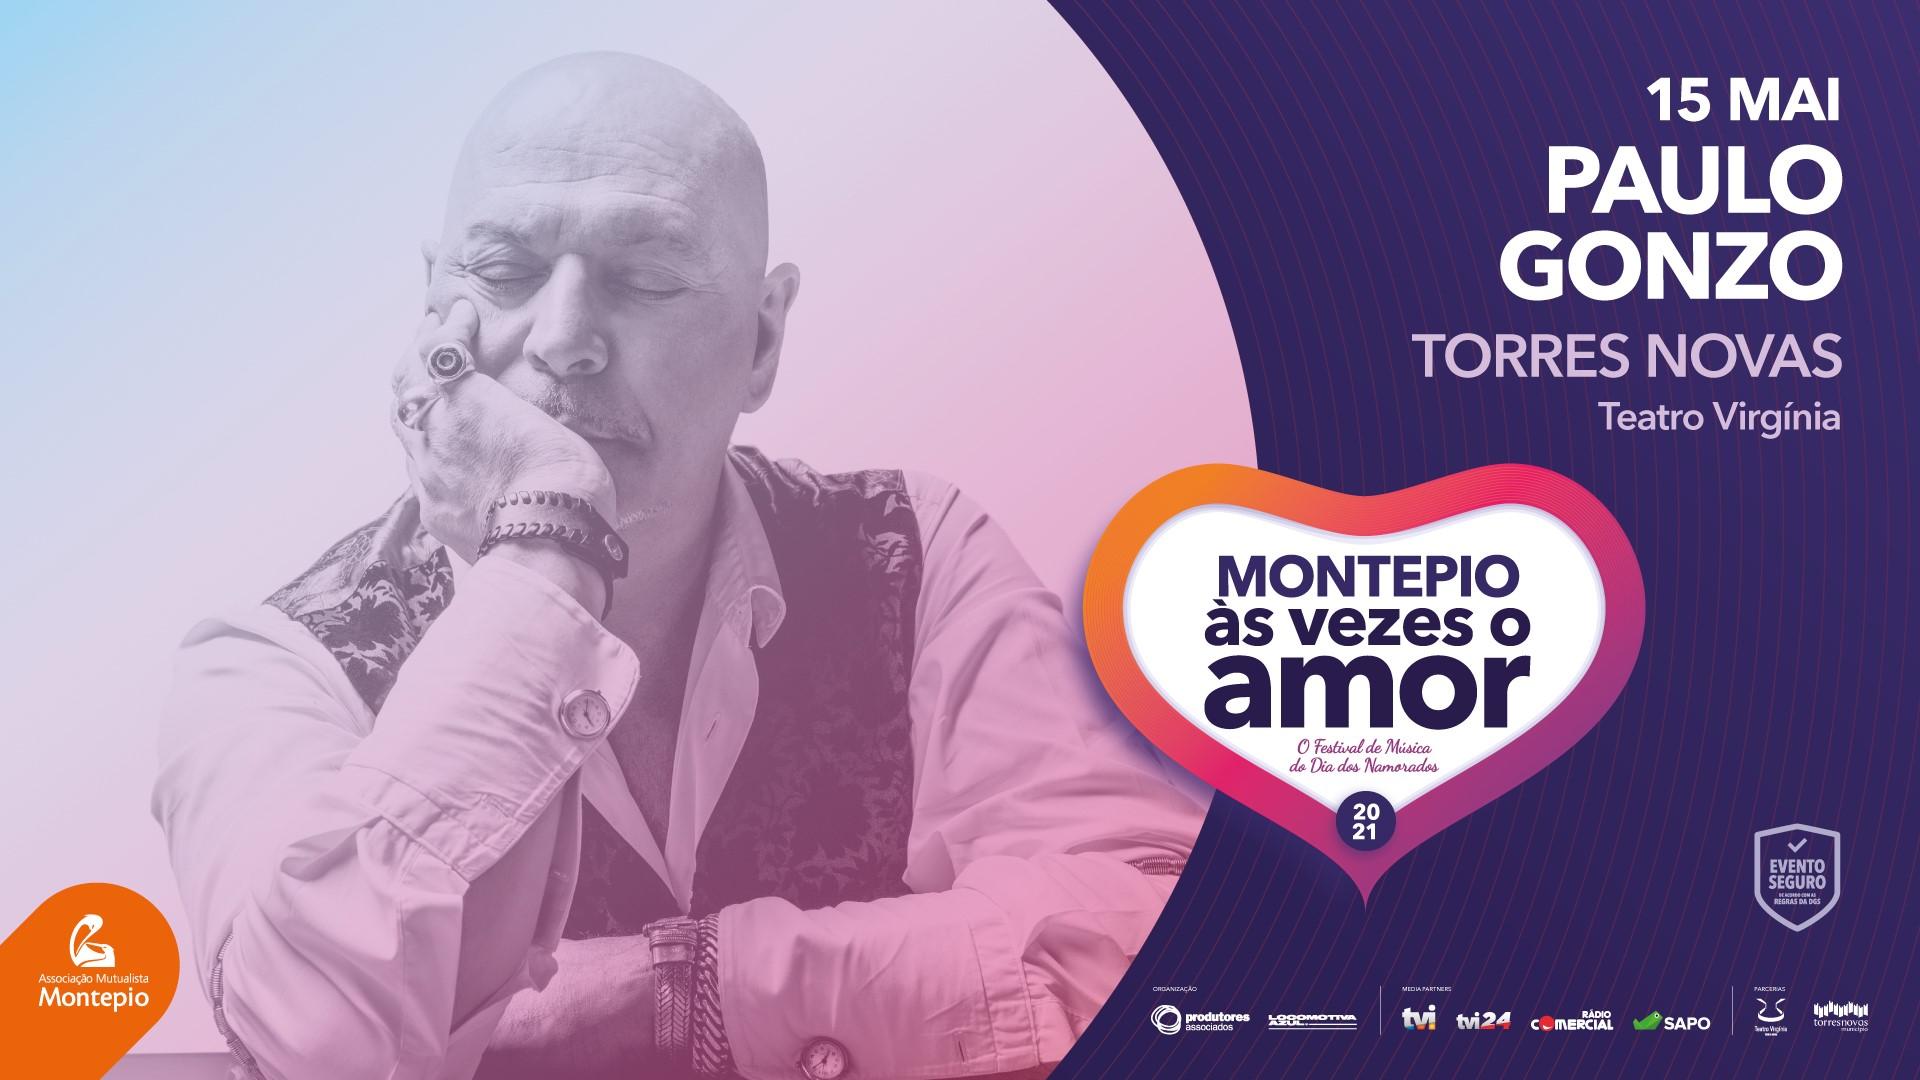 PAULO GONZO - Montepio Às Vezes o Amor - TORRES NOVAS